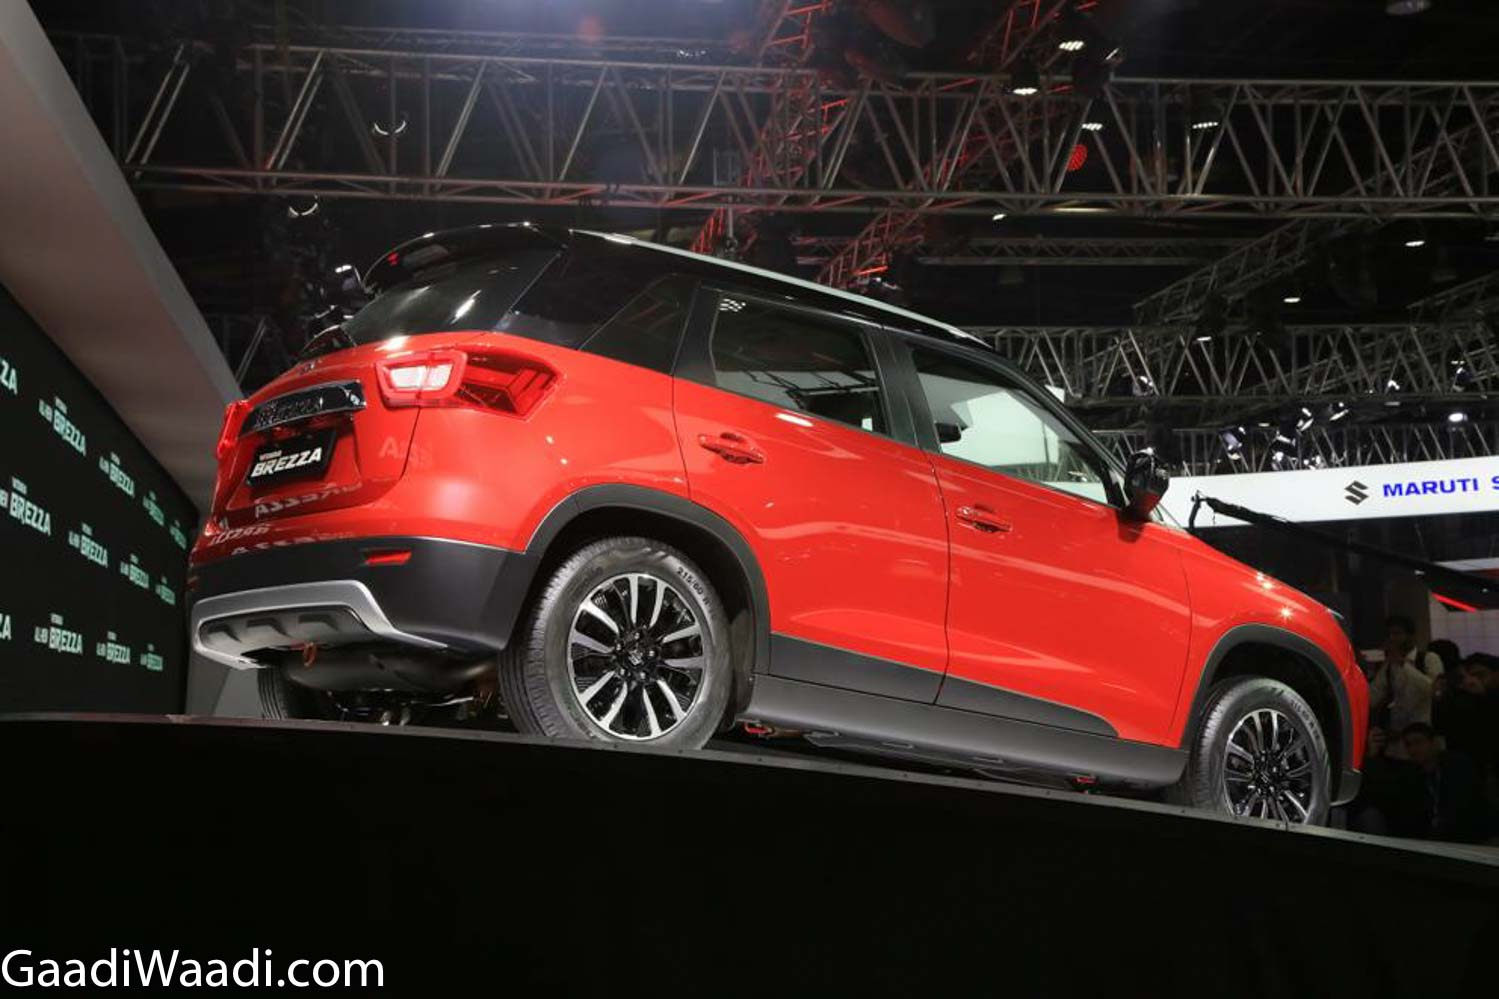 2020 - [Inde] Auto Expo - The Motor Show 2020 2020-Maruti-Suzuki-Vitara-Brezza-1